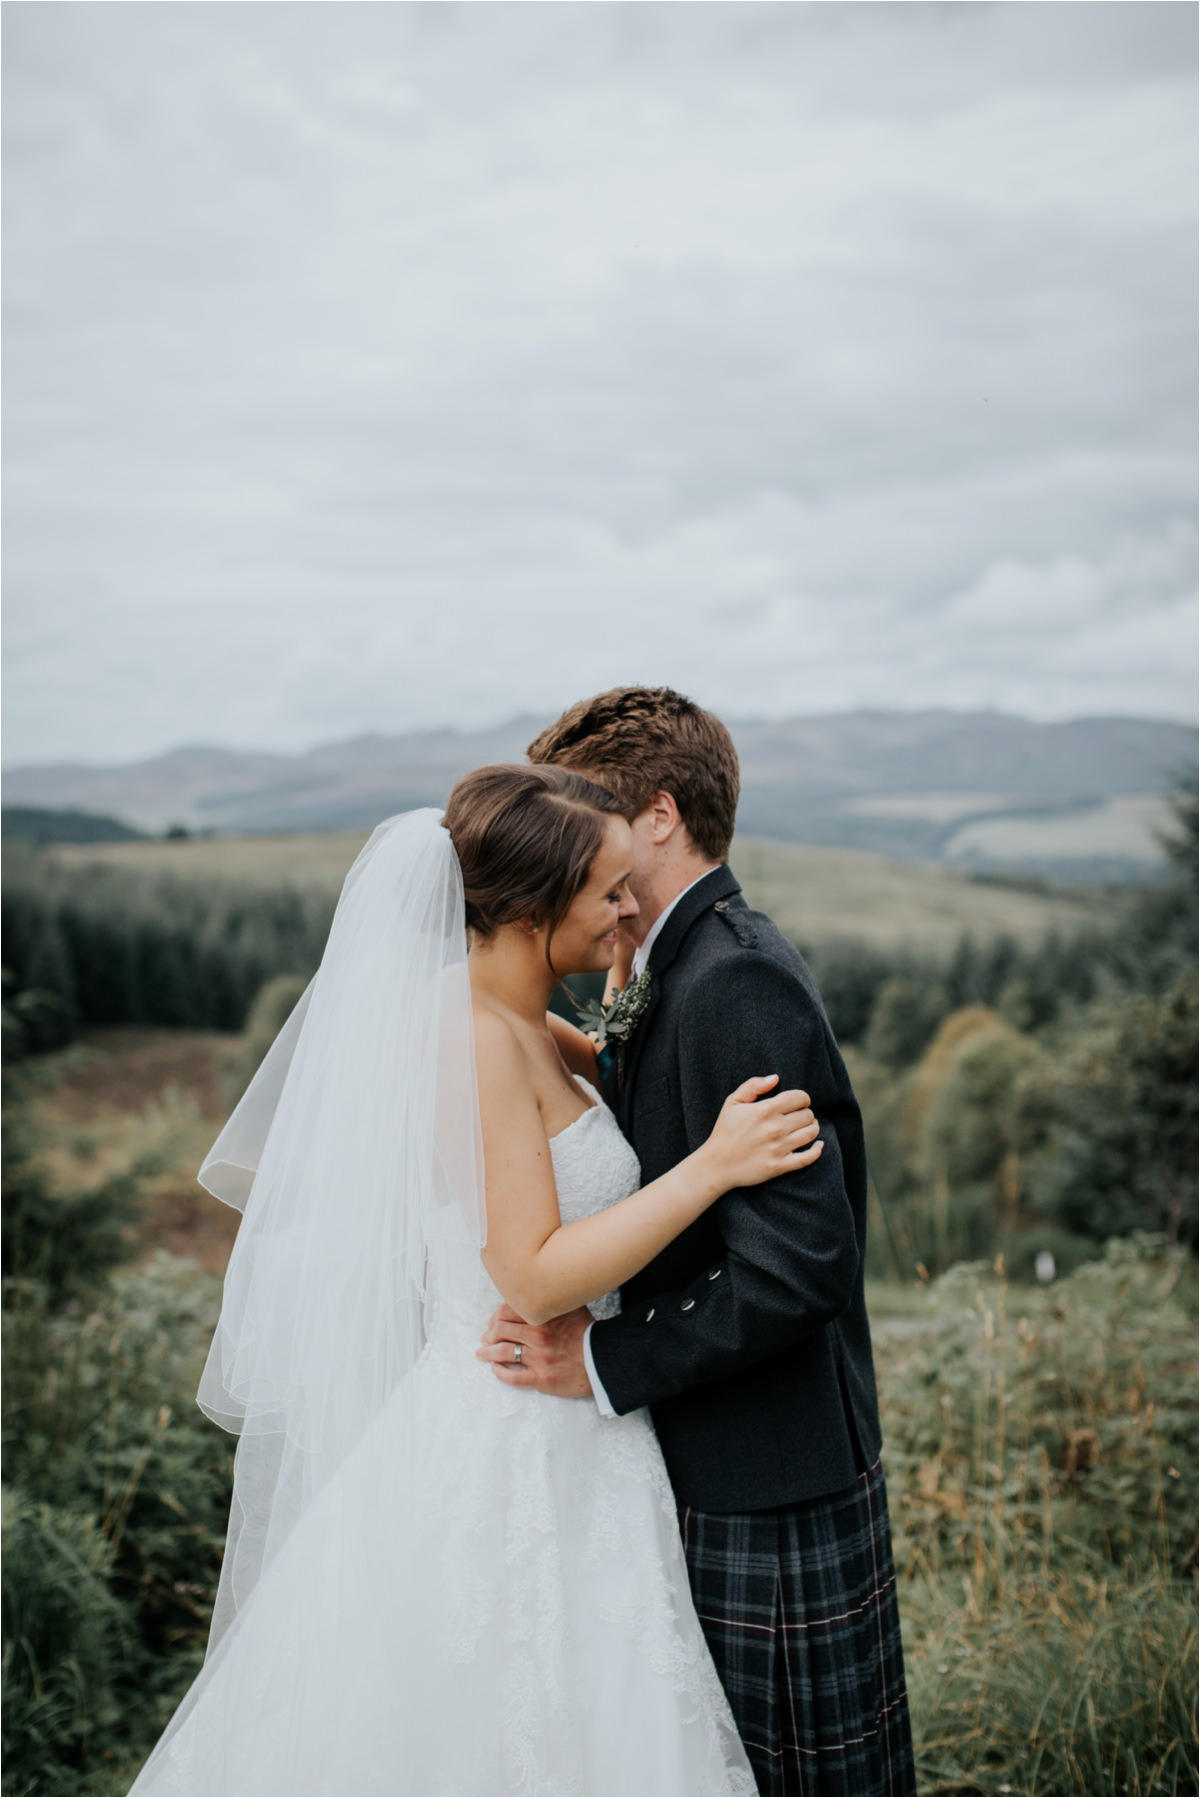 Photography 78 - Glasgow Wedding Photographer -Jonathan & Corrie's Garden Wedding in Aberfeldy - Dunkeld Cathedral_0082.jpg